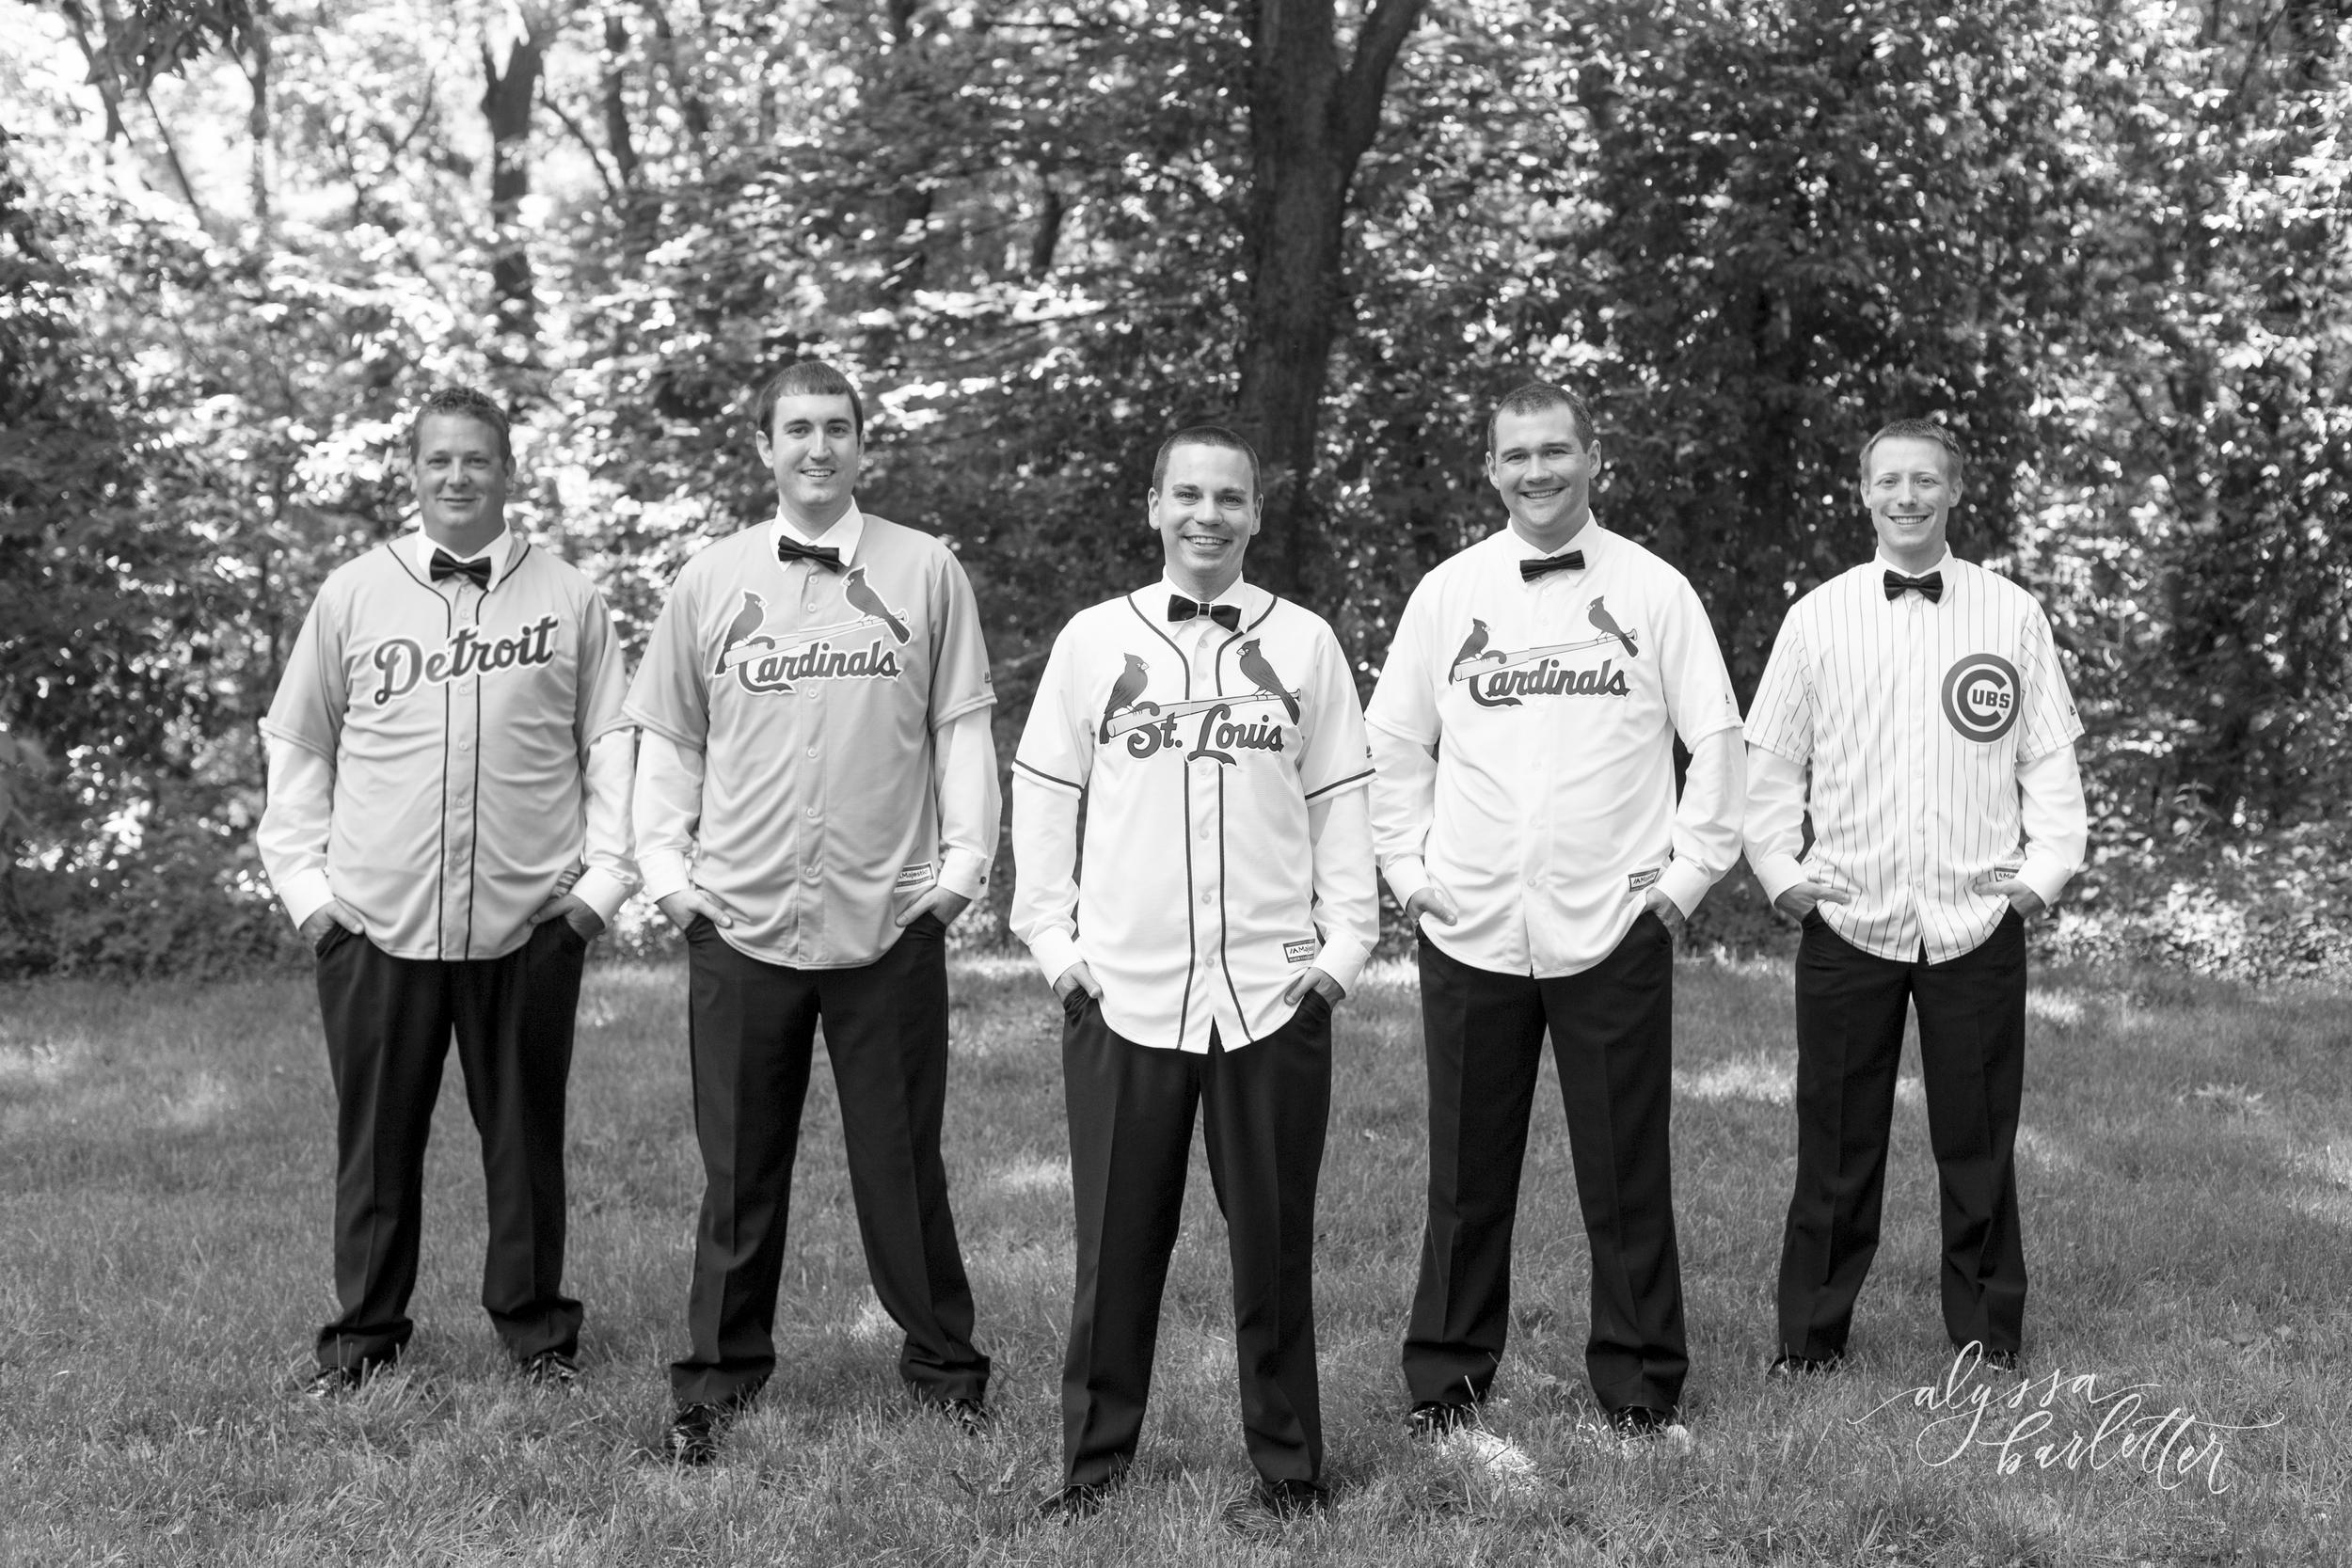 alyssa barletter photography groomsmen gifts baseball jersey wedding